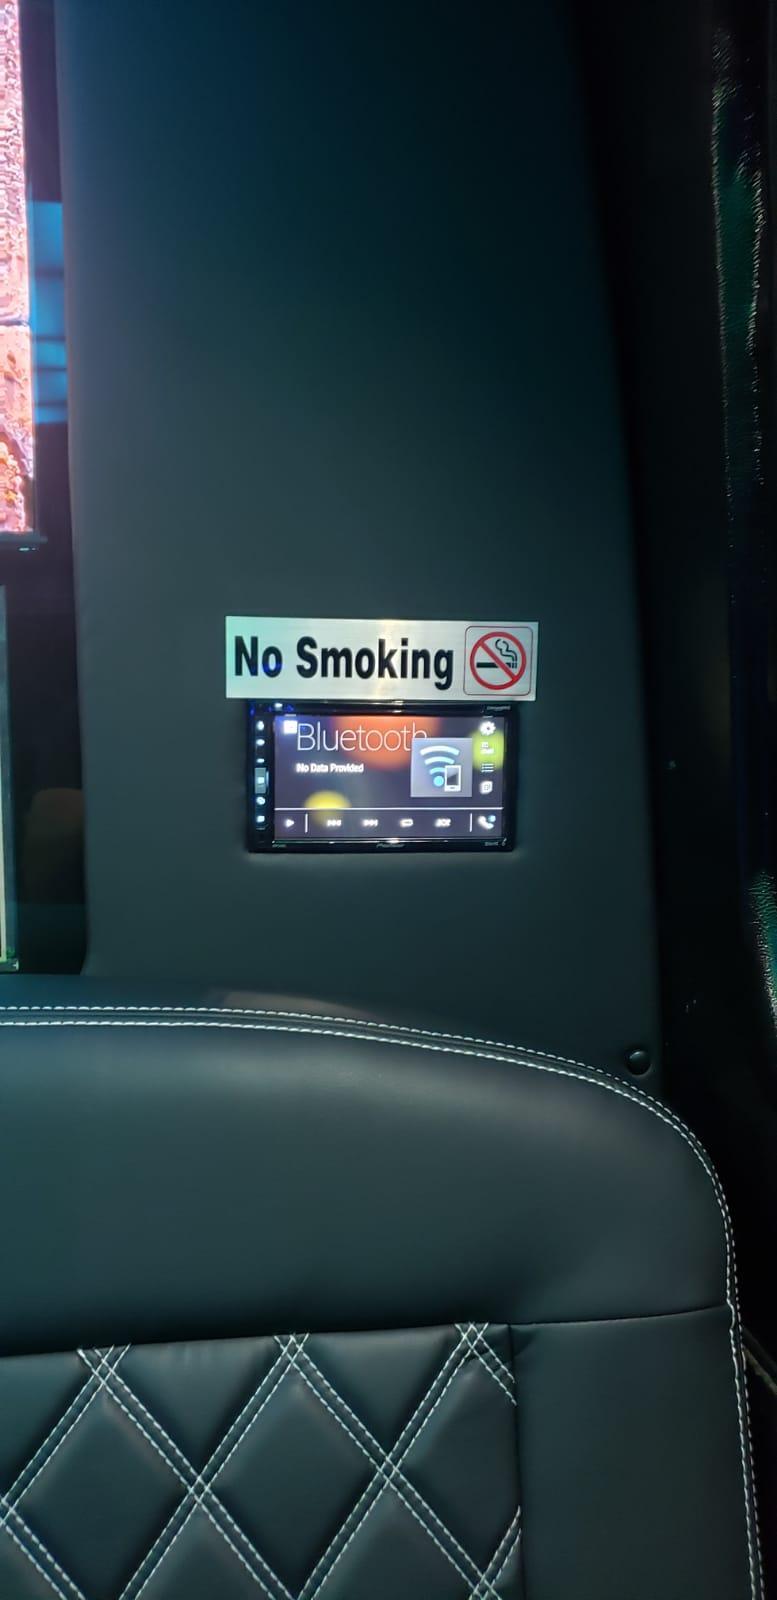 10-14 PASSENGERS PARTY BUS - Inside No Smoke